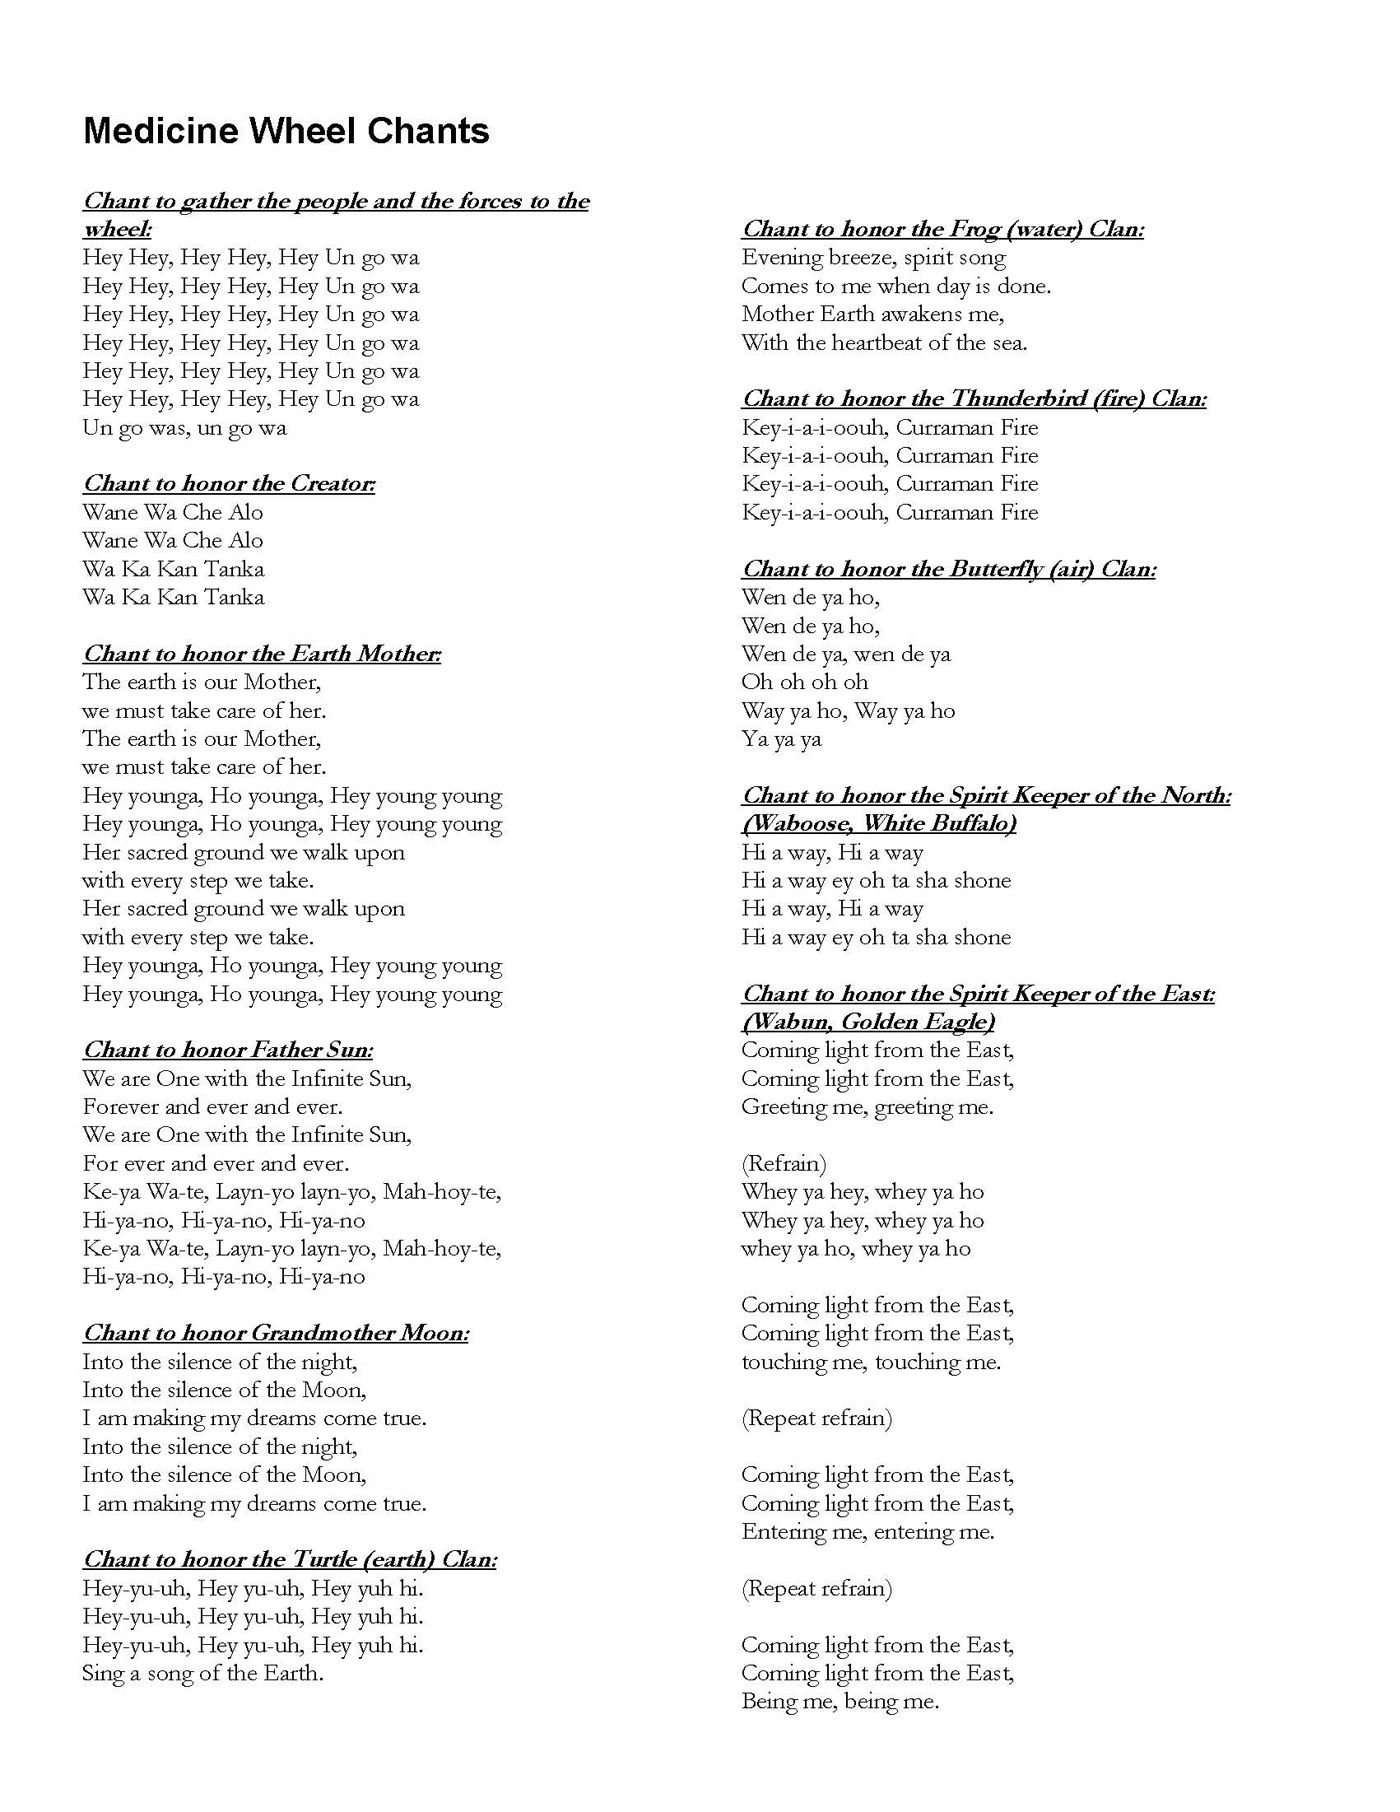 Printable Medicine Wheel Songs